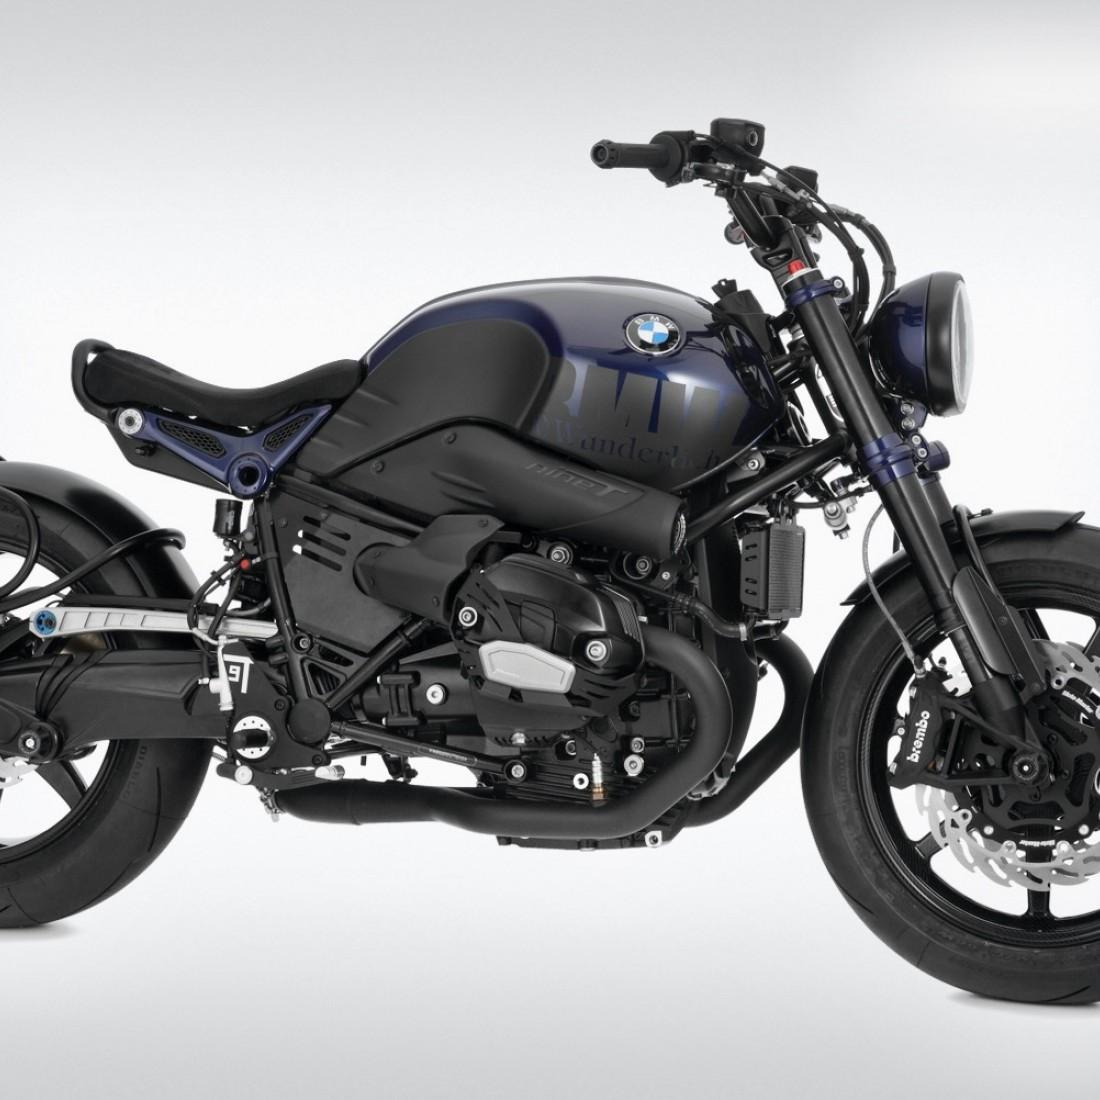 R Ninet Tail Conversion Bobber Black